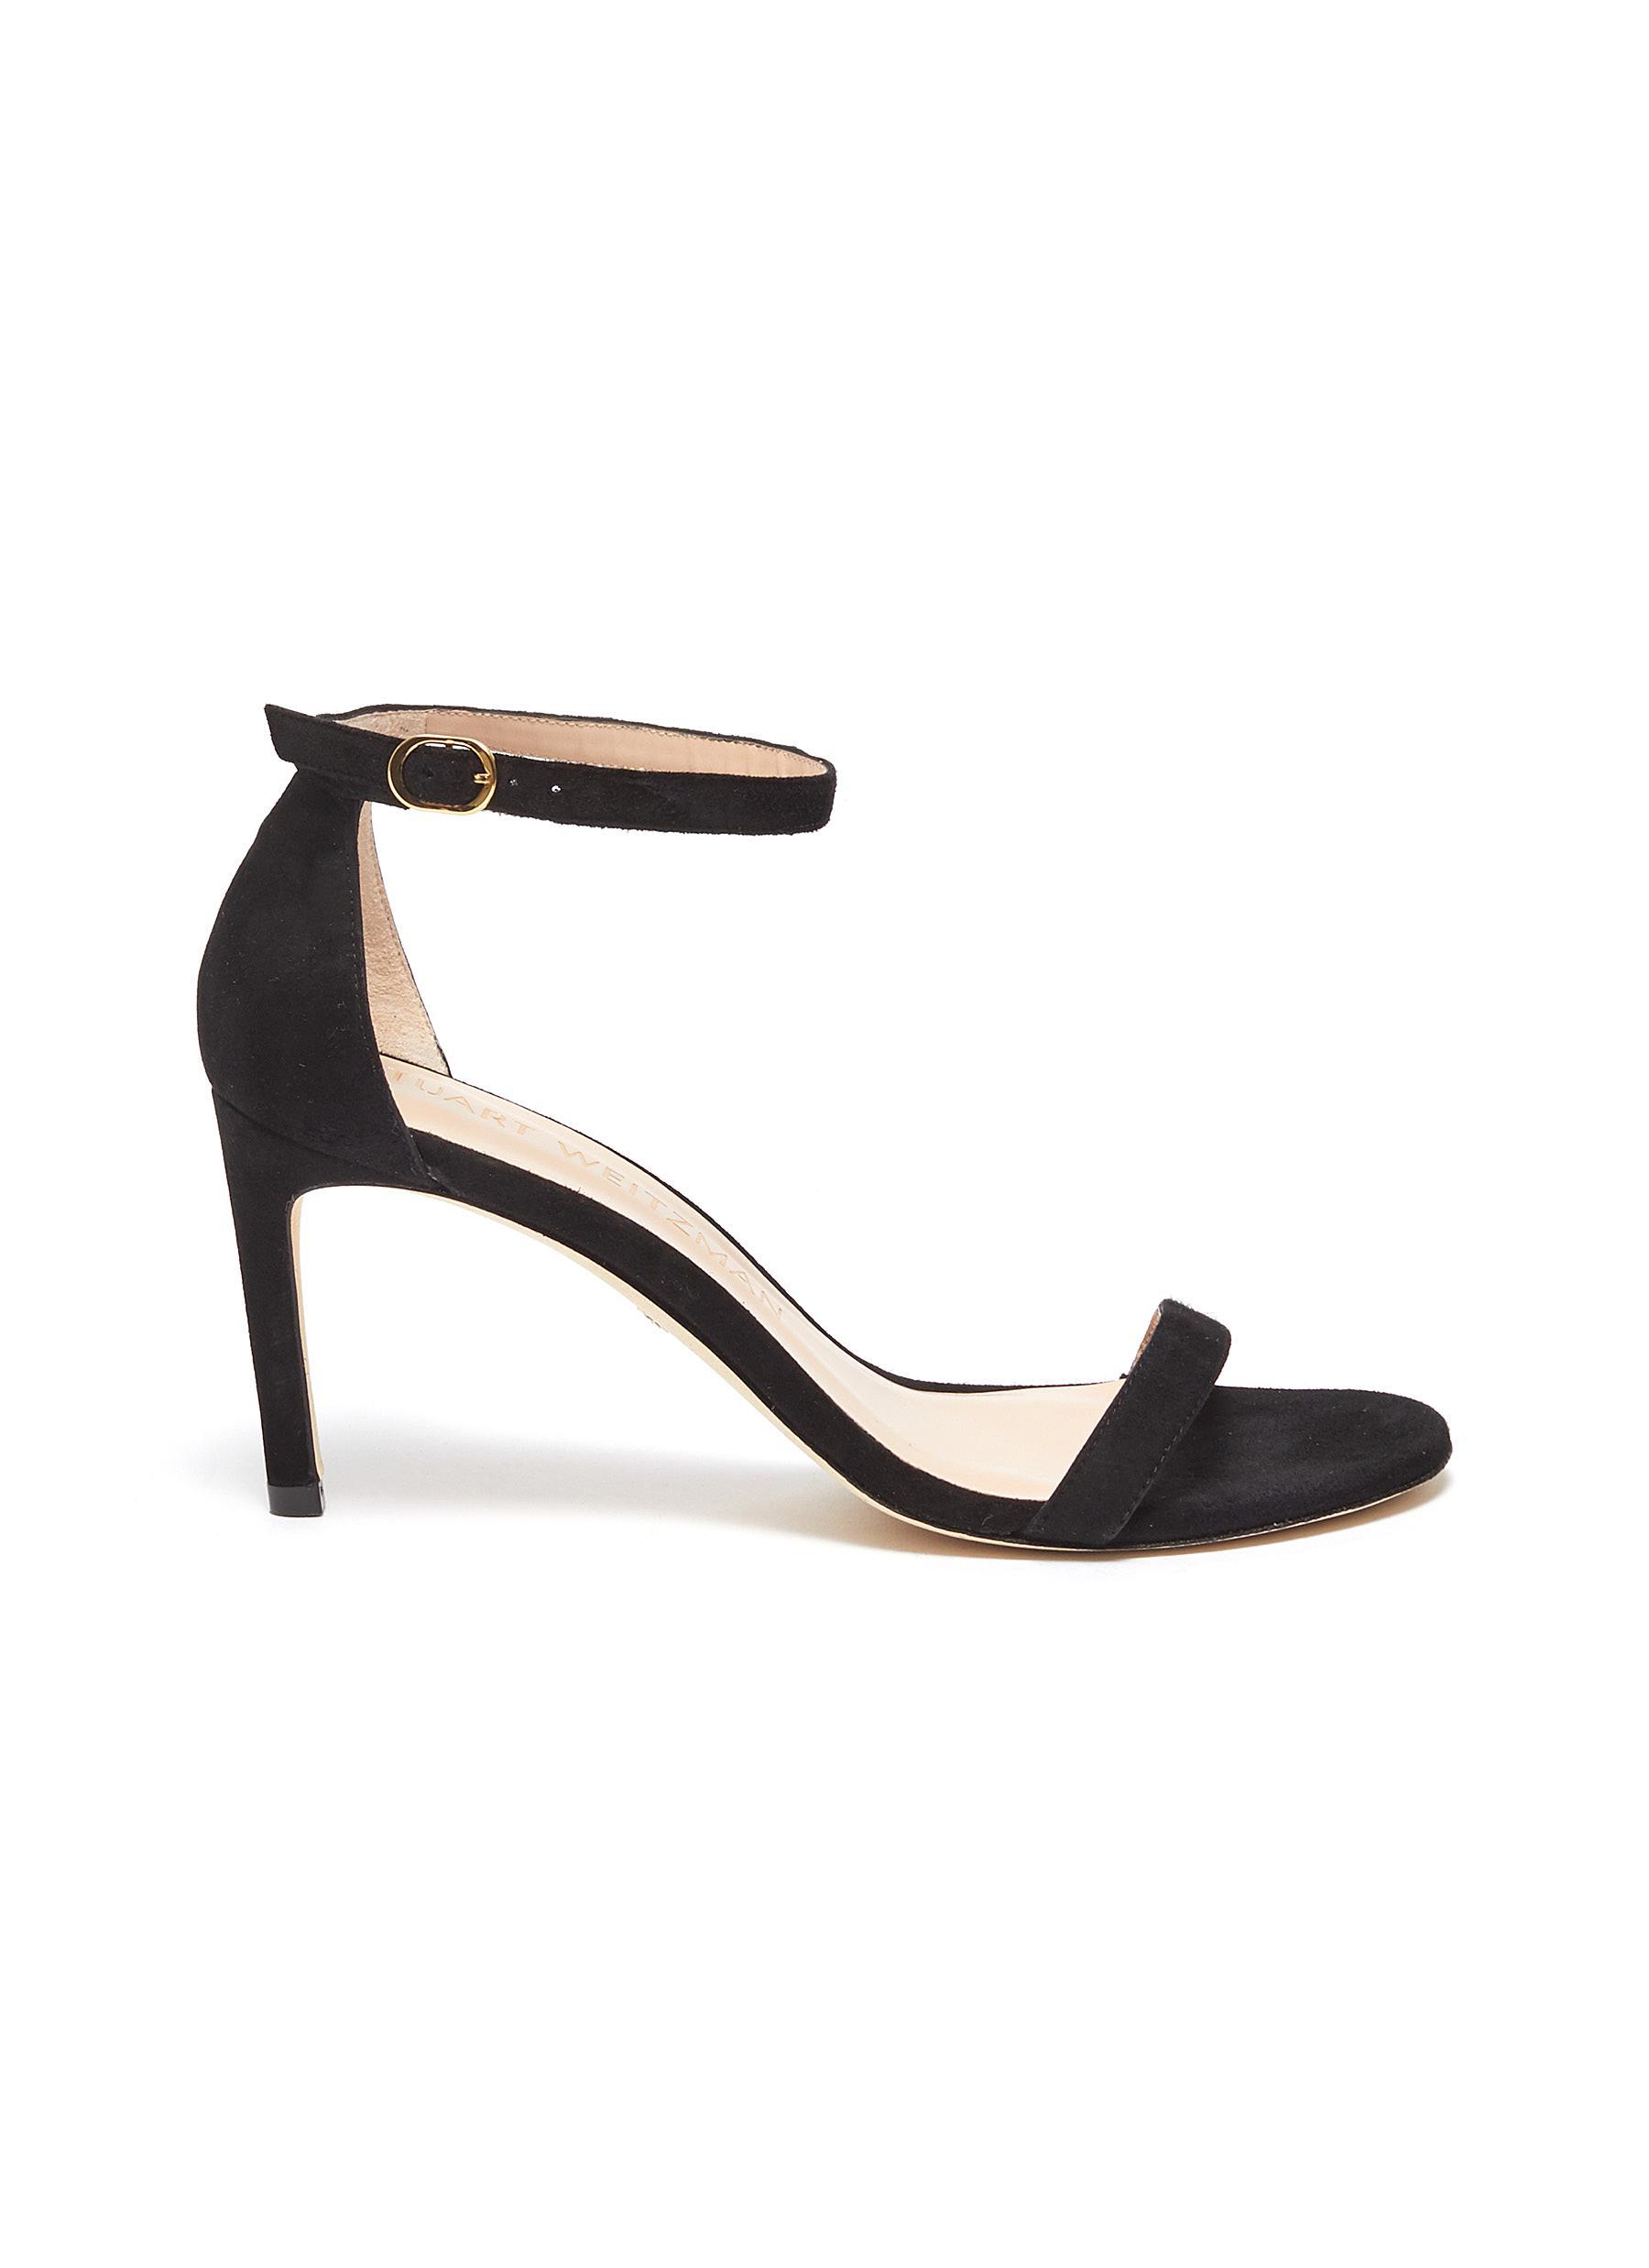 Stuart Weitzman High Heels Nunakedstraight suede heeled sandals